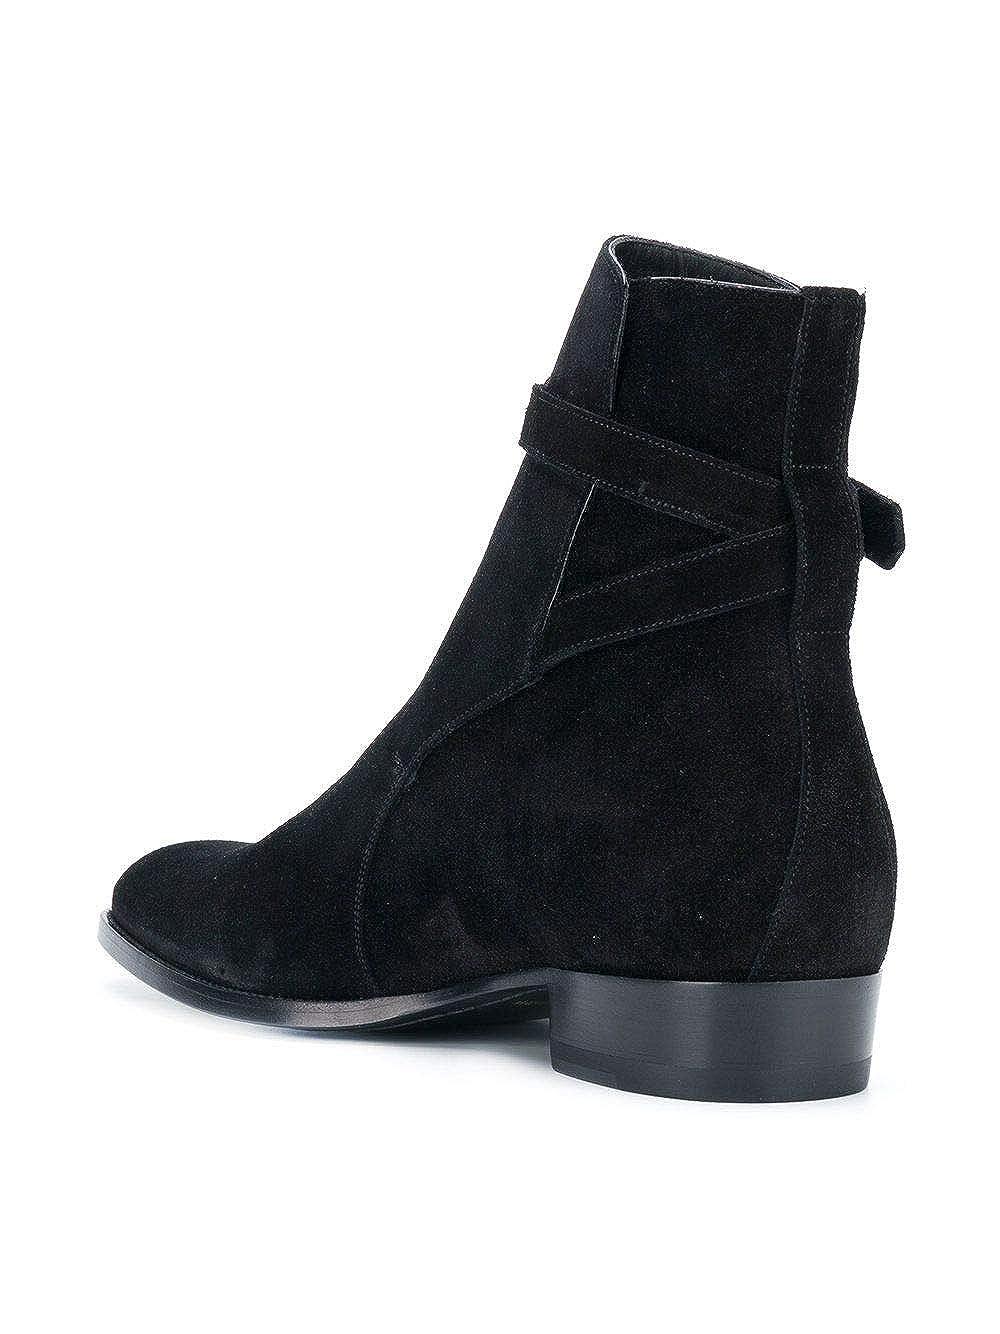 Saint Laurent Hombre 498372Bt3001000 Negro Gamuza Botines: Amazon.es: Zapatos y complementos